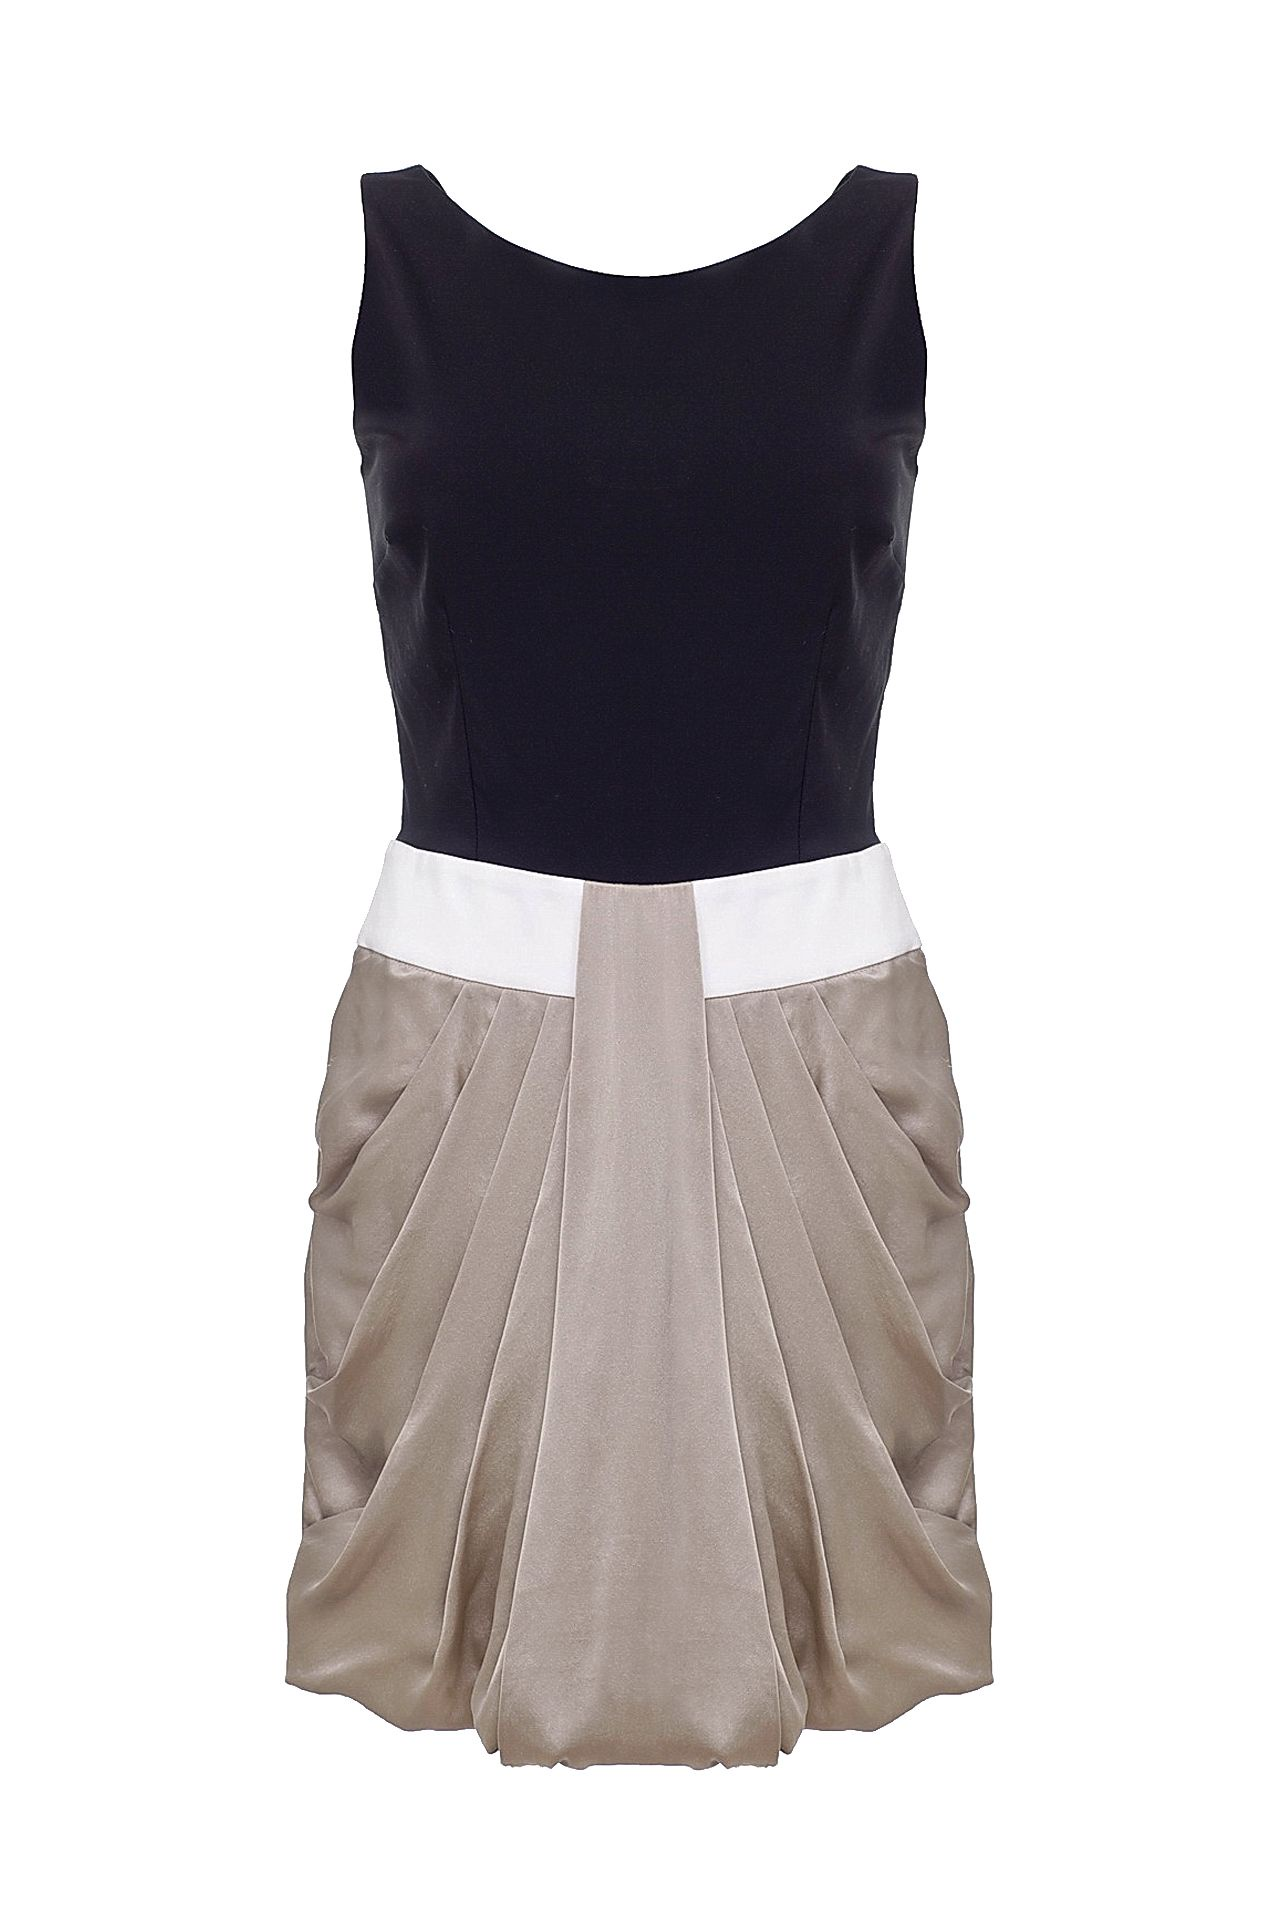 Фото - Платье SPACE женское платье fragrance space shadows axsy2243 2015